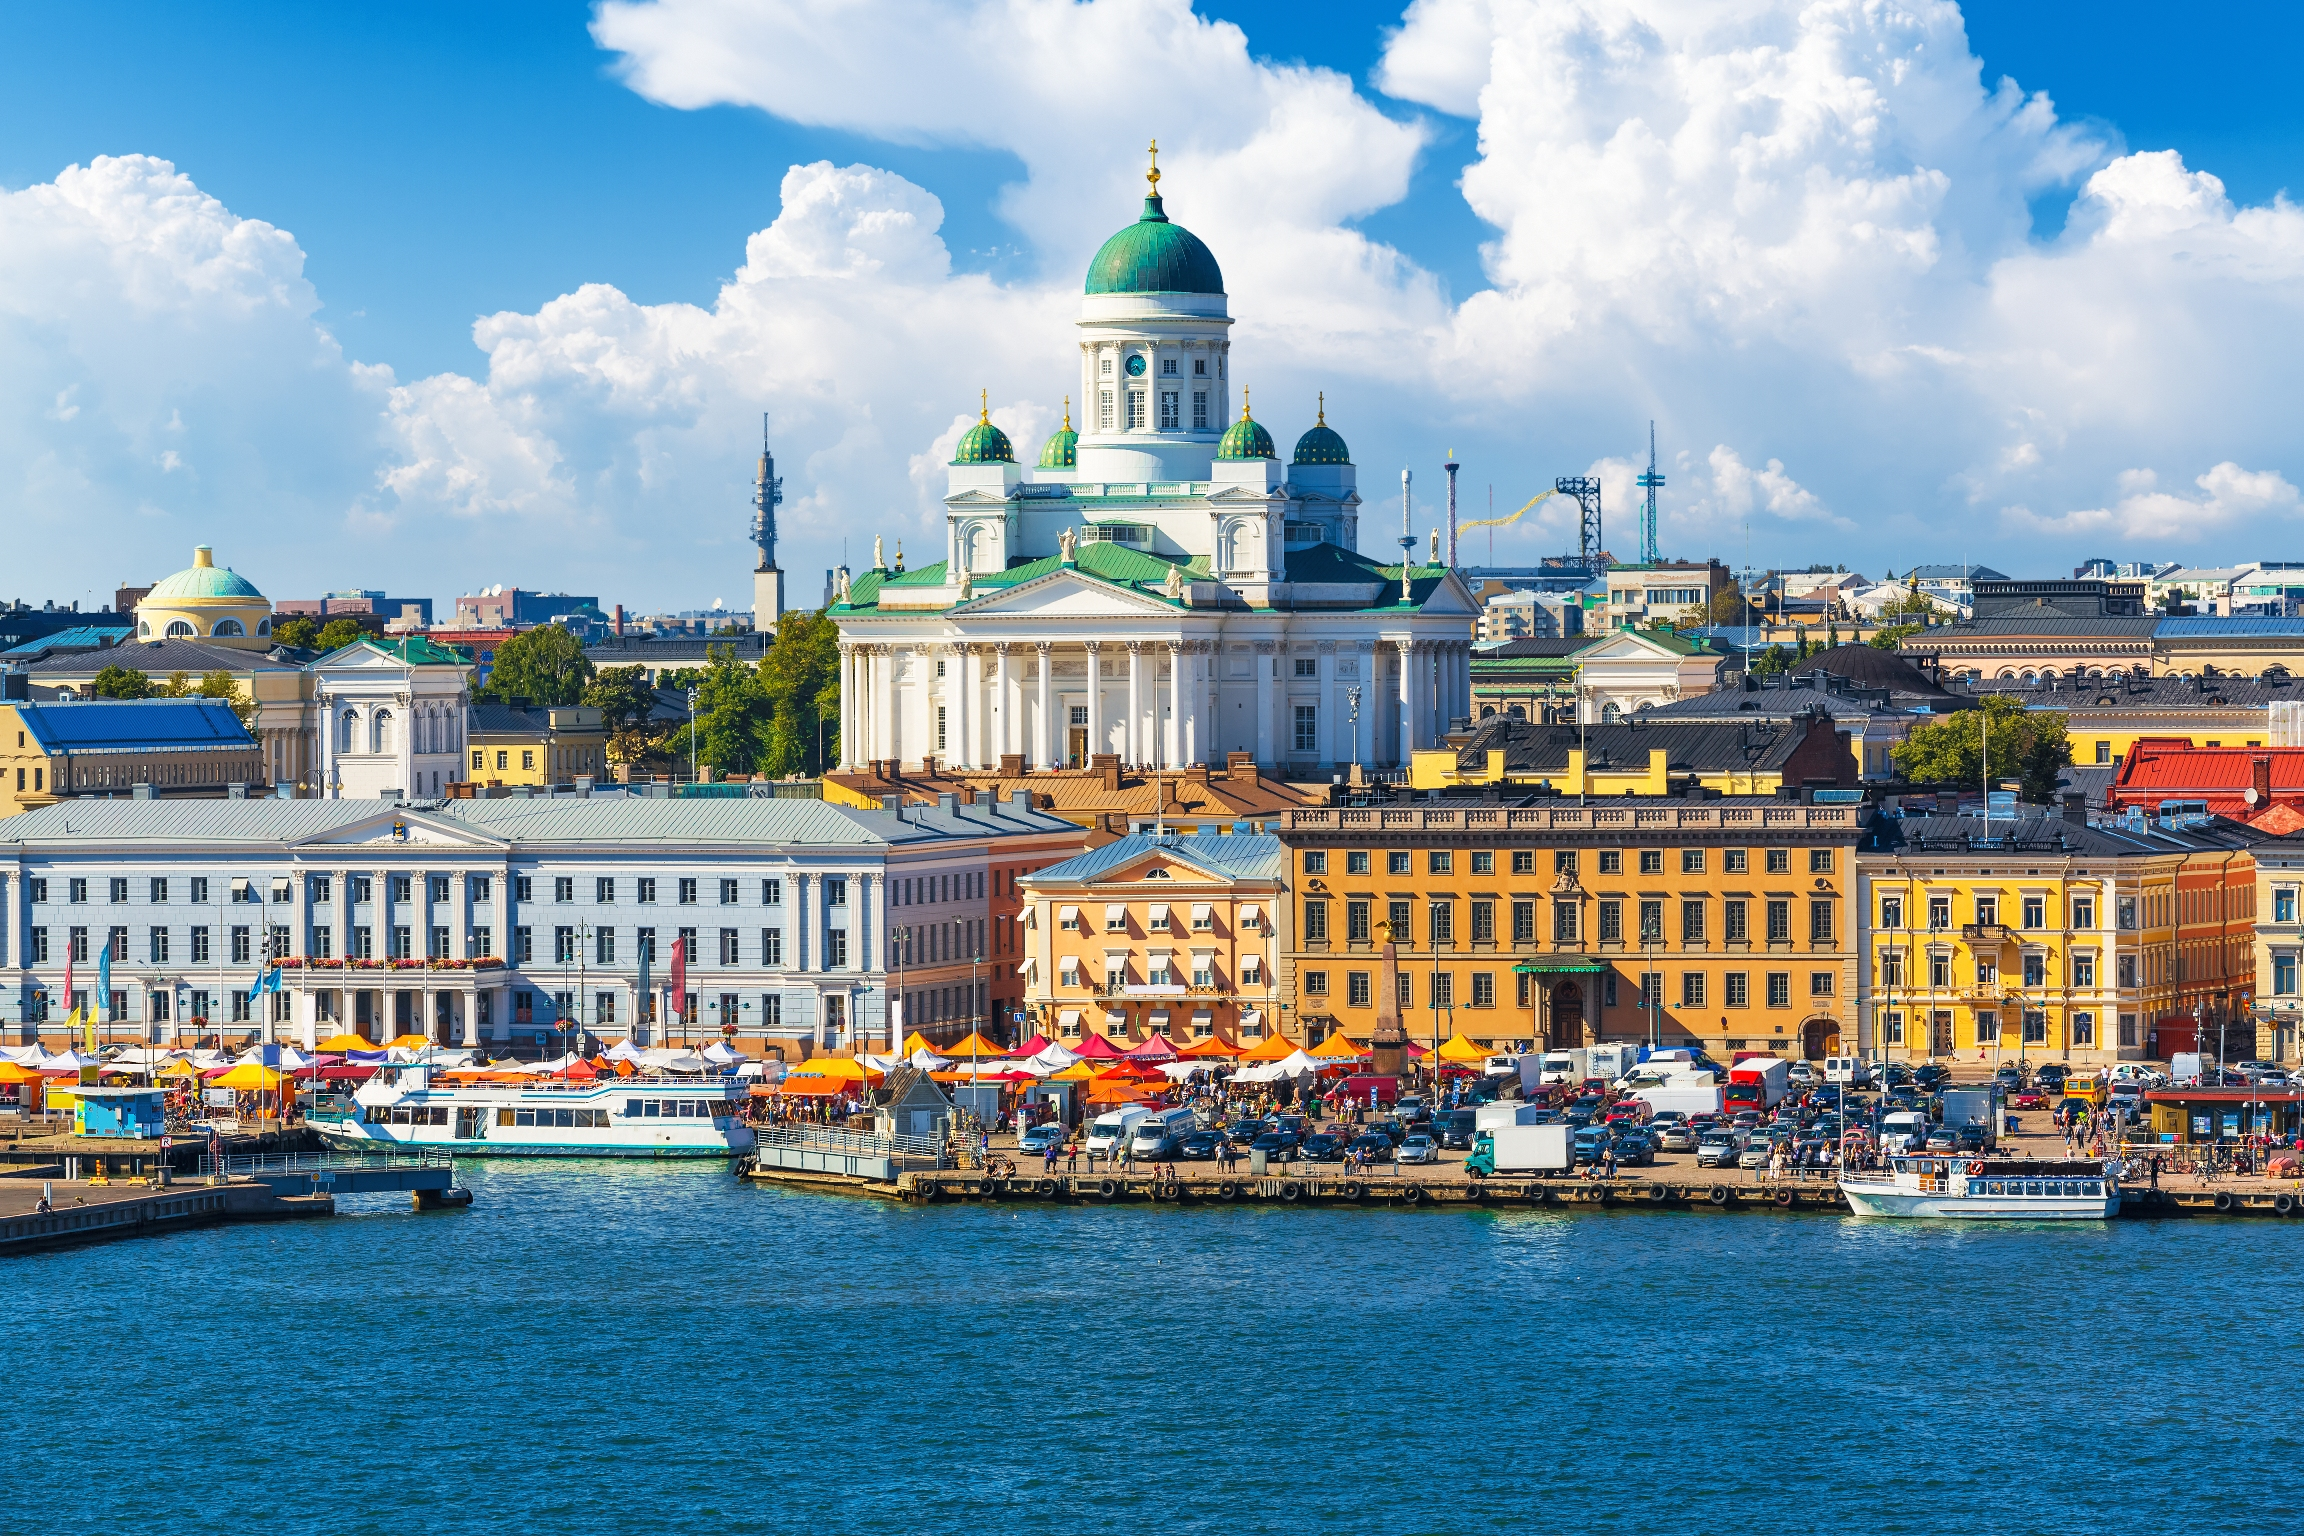 Helsinki in the summer time